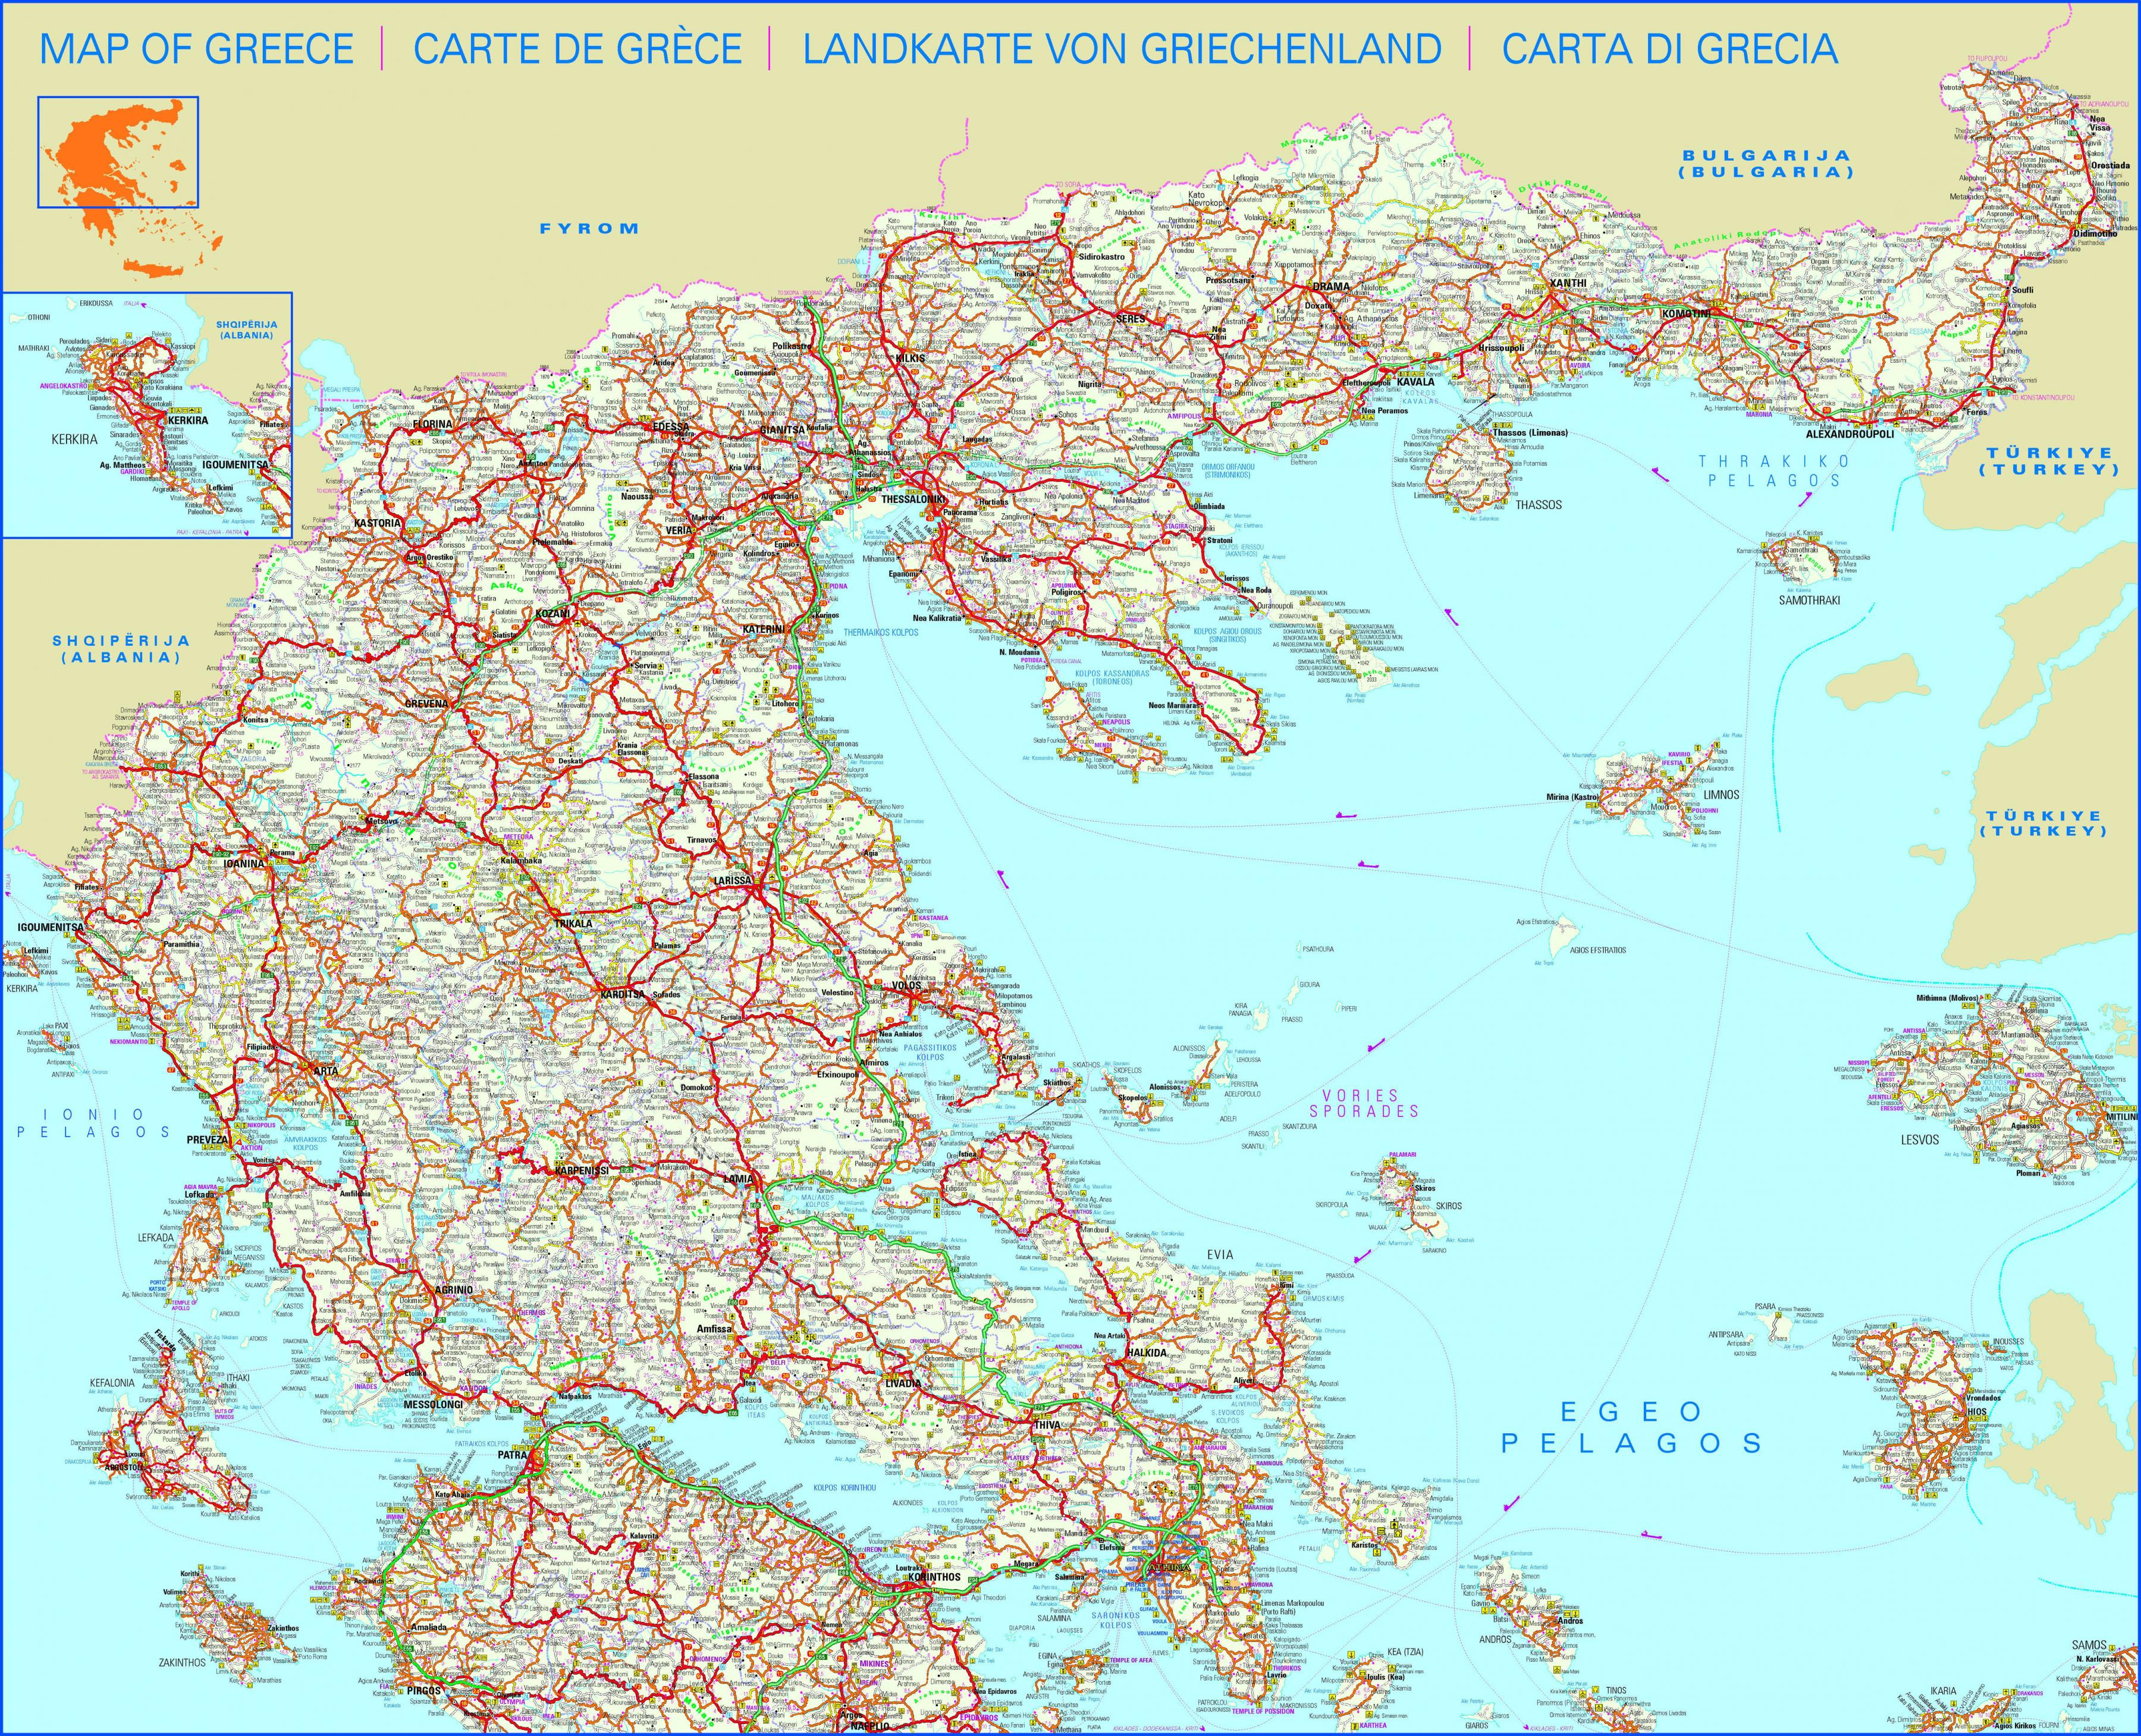 Cartina Geografica Europa Meridionale.Grecia Mappa Stradale Mappa Stradale Di Grecia Europa Del Sud Europa